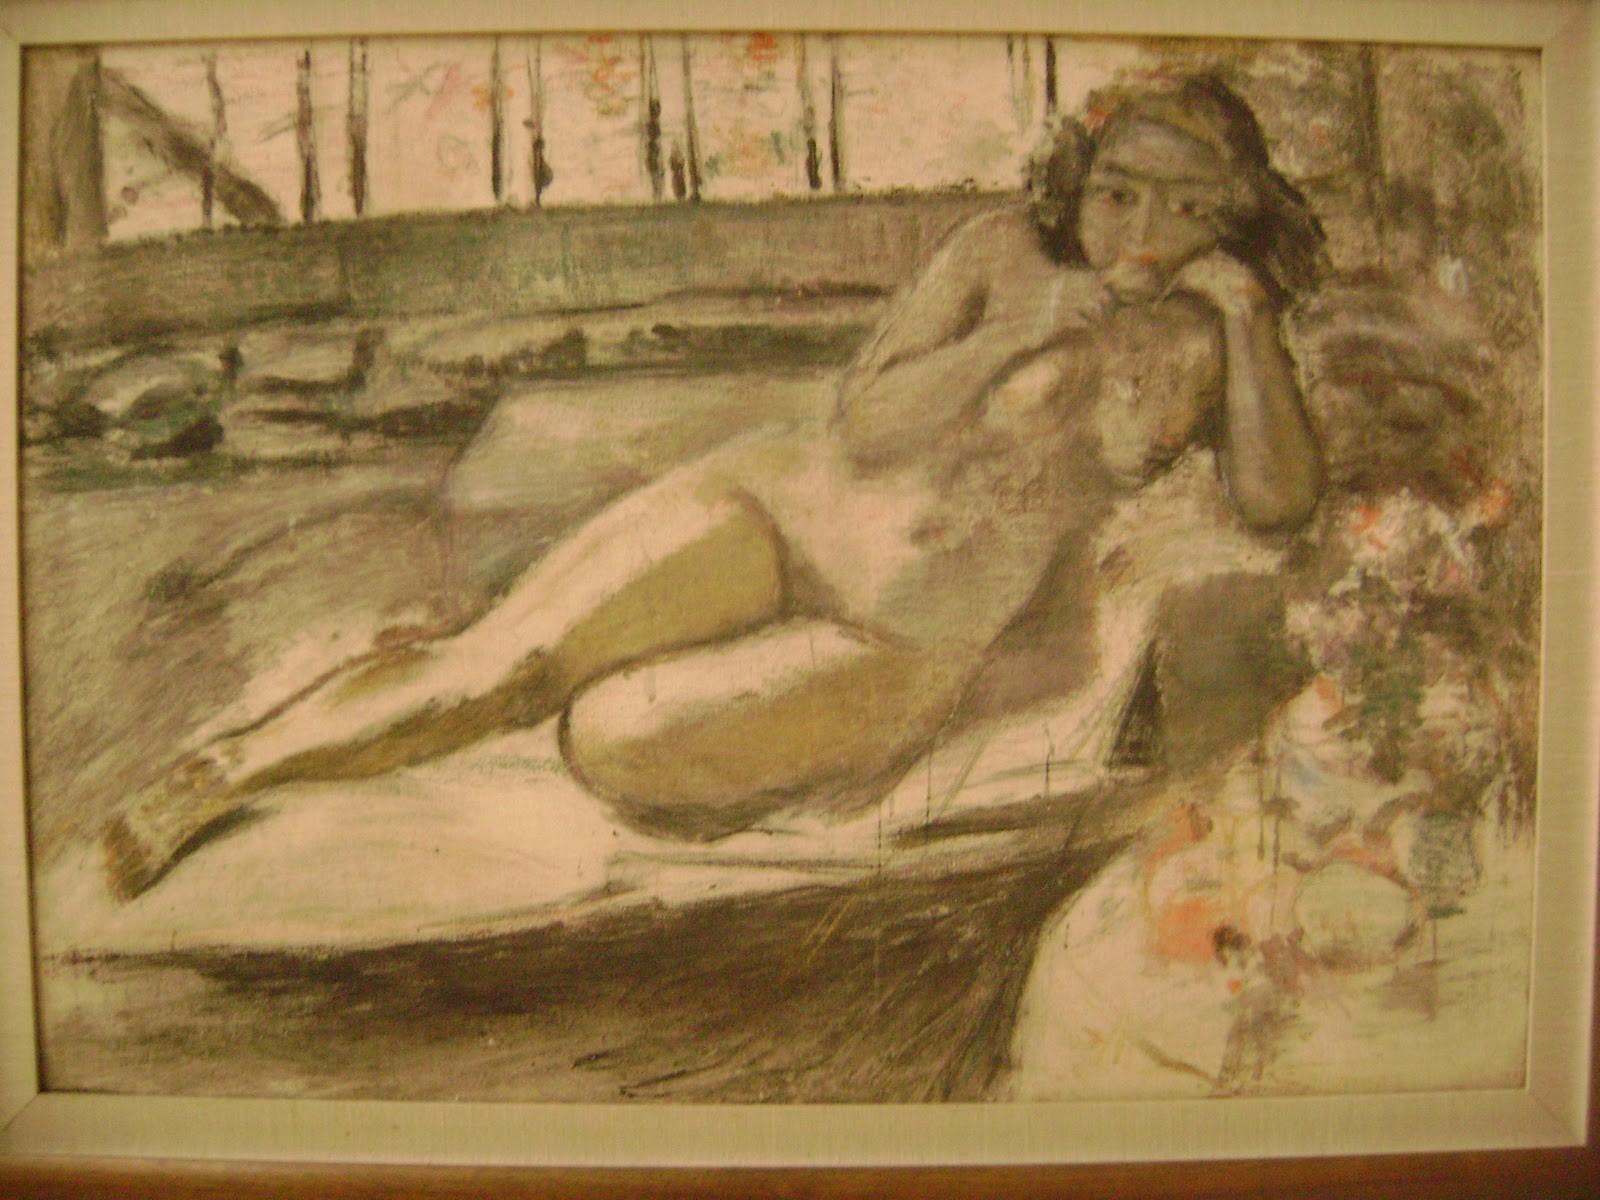 Juanita desnuda.